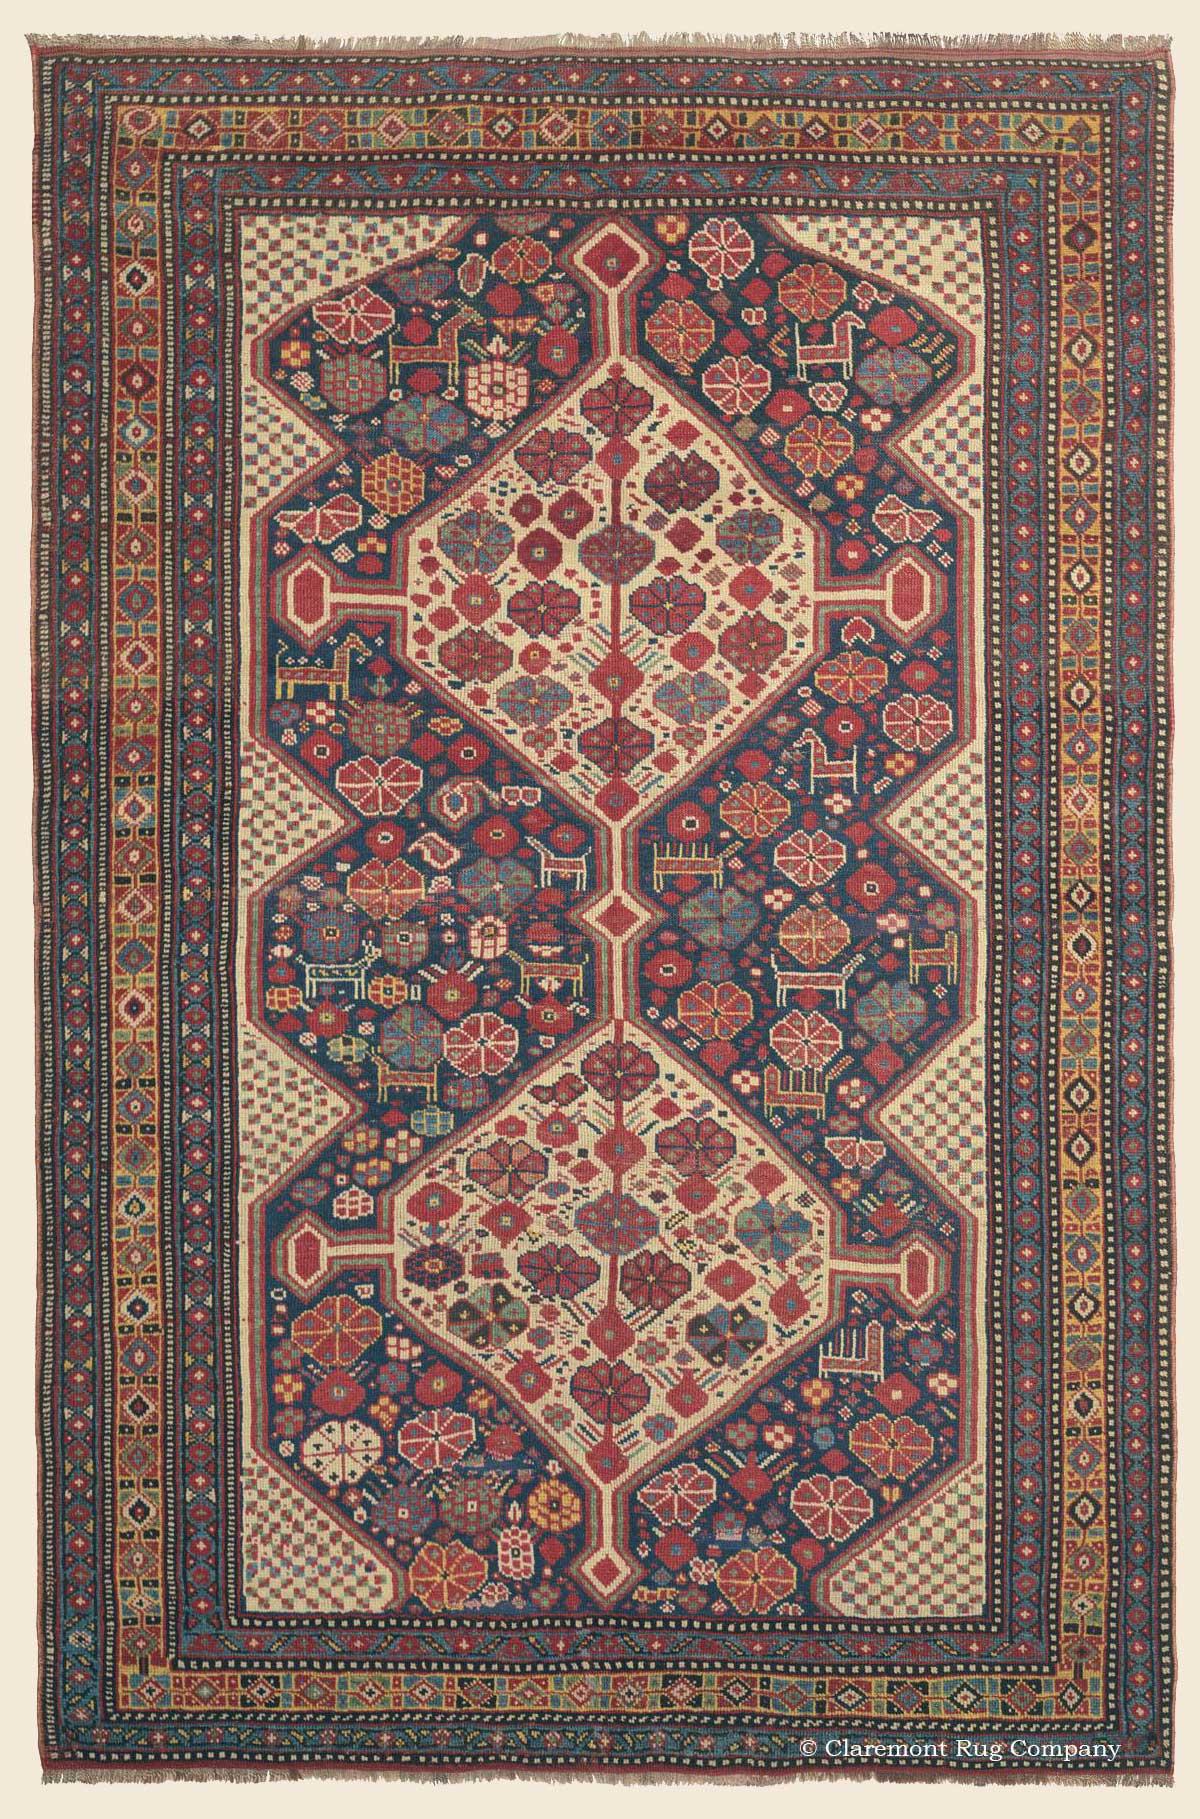 qashqai southwest persian antique rug claremont rug company. Black Bedroom Furniture Sets. Home Design Ideas